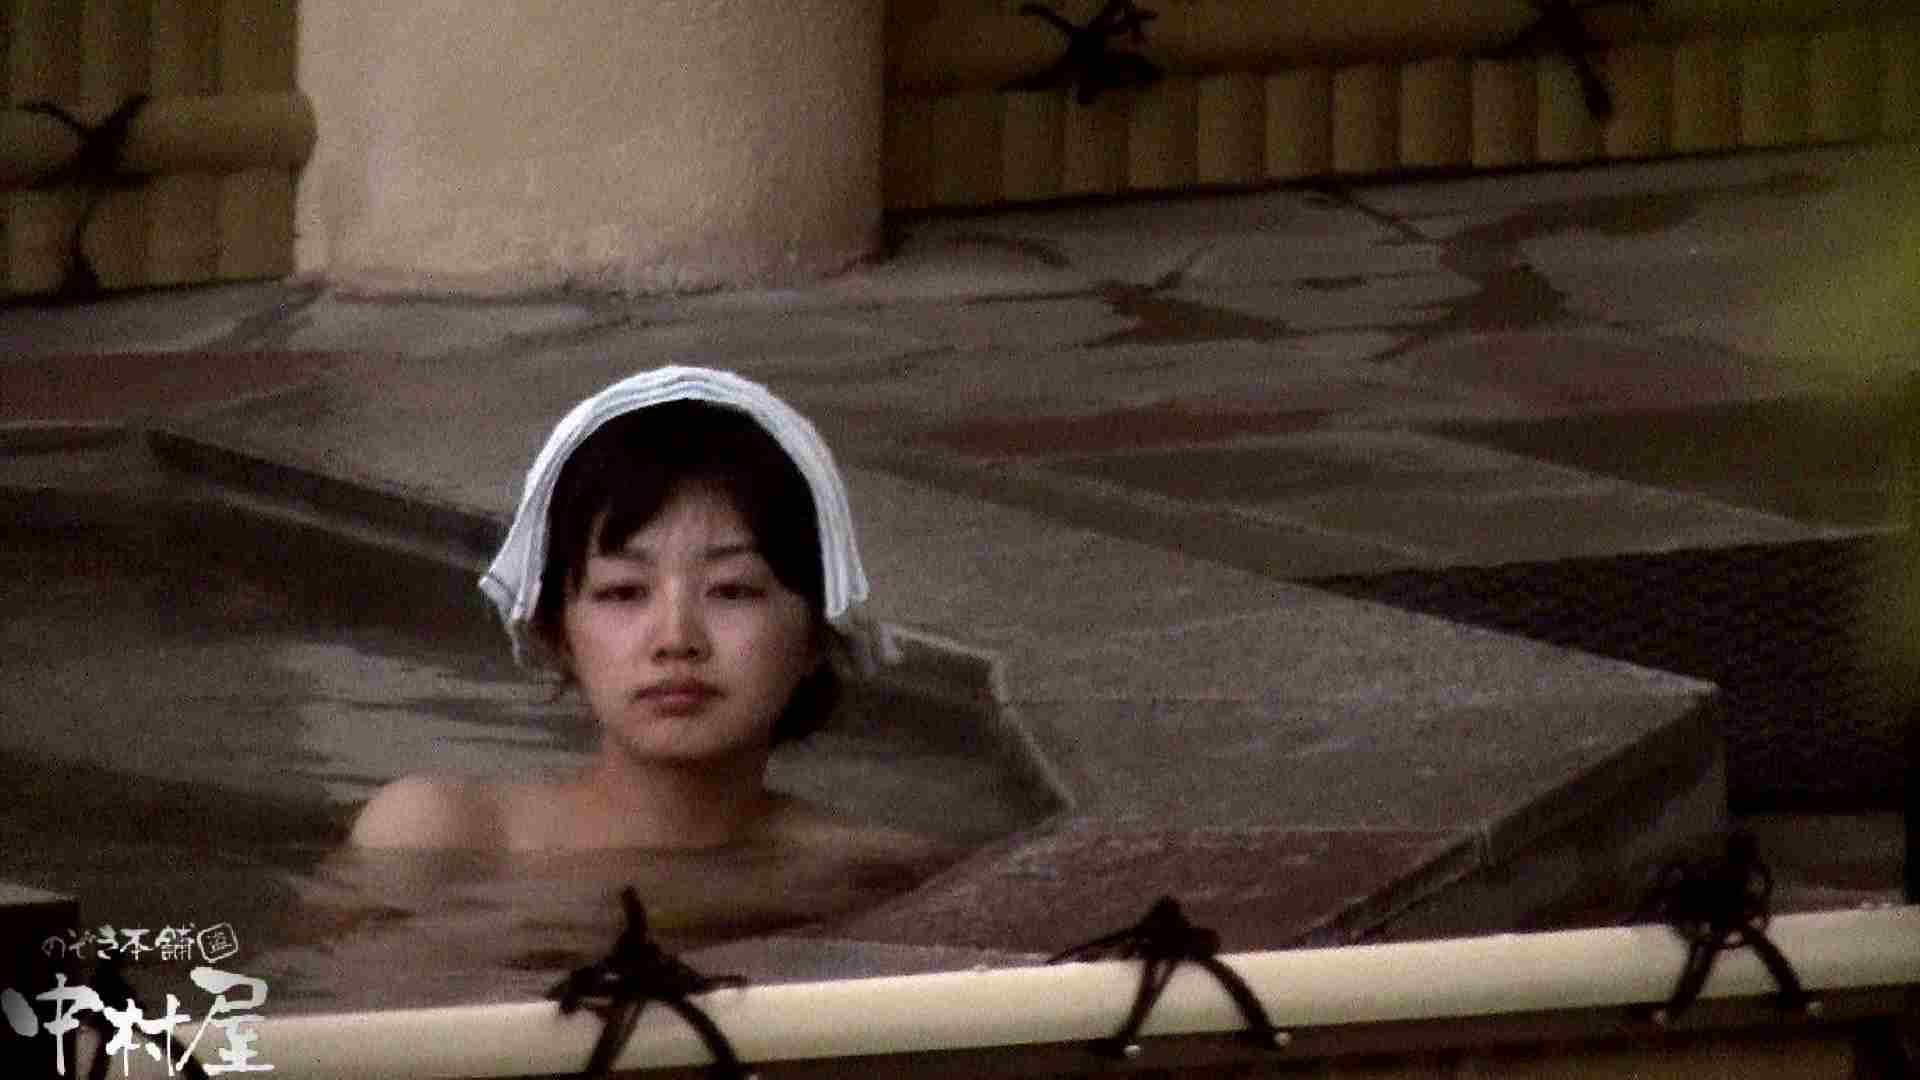 Aquaな露天風呂Vol.916 盗撮大放出 盗み撮り動画 75連発 22